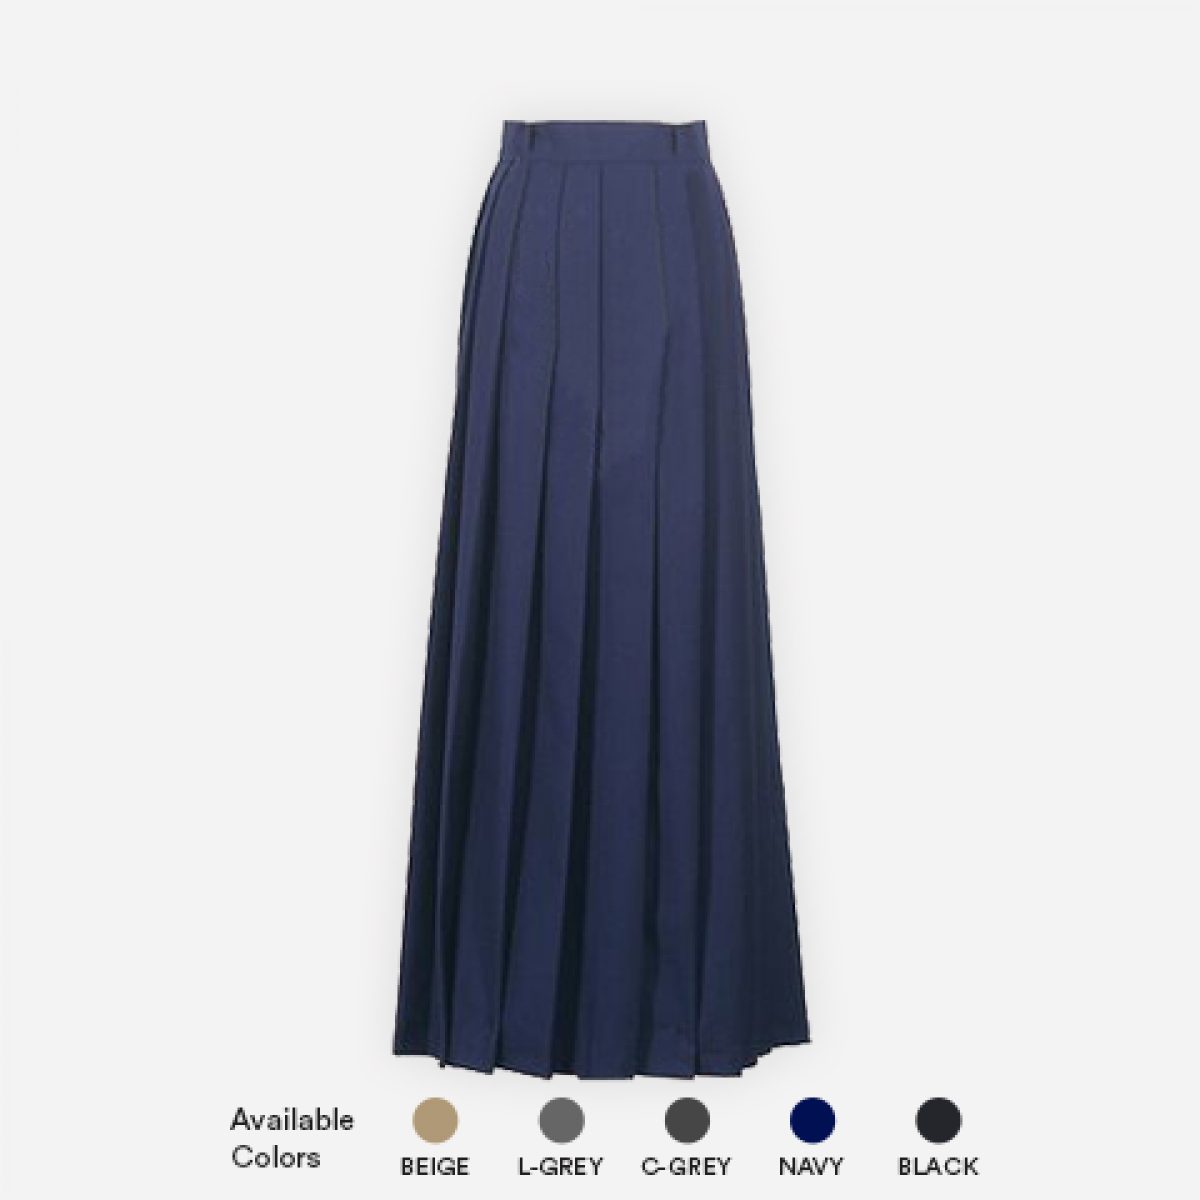 b10711ef0 Girls Ankle Length Knife Pleated Skirt |School Apparel |Grades Store ...